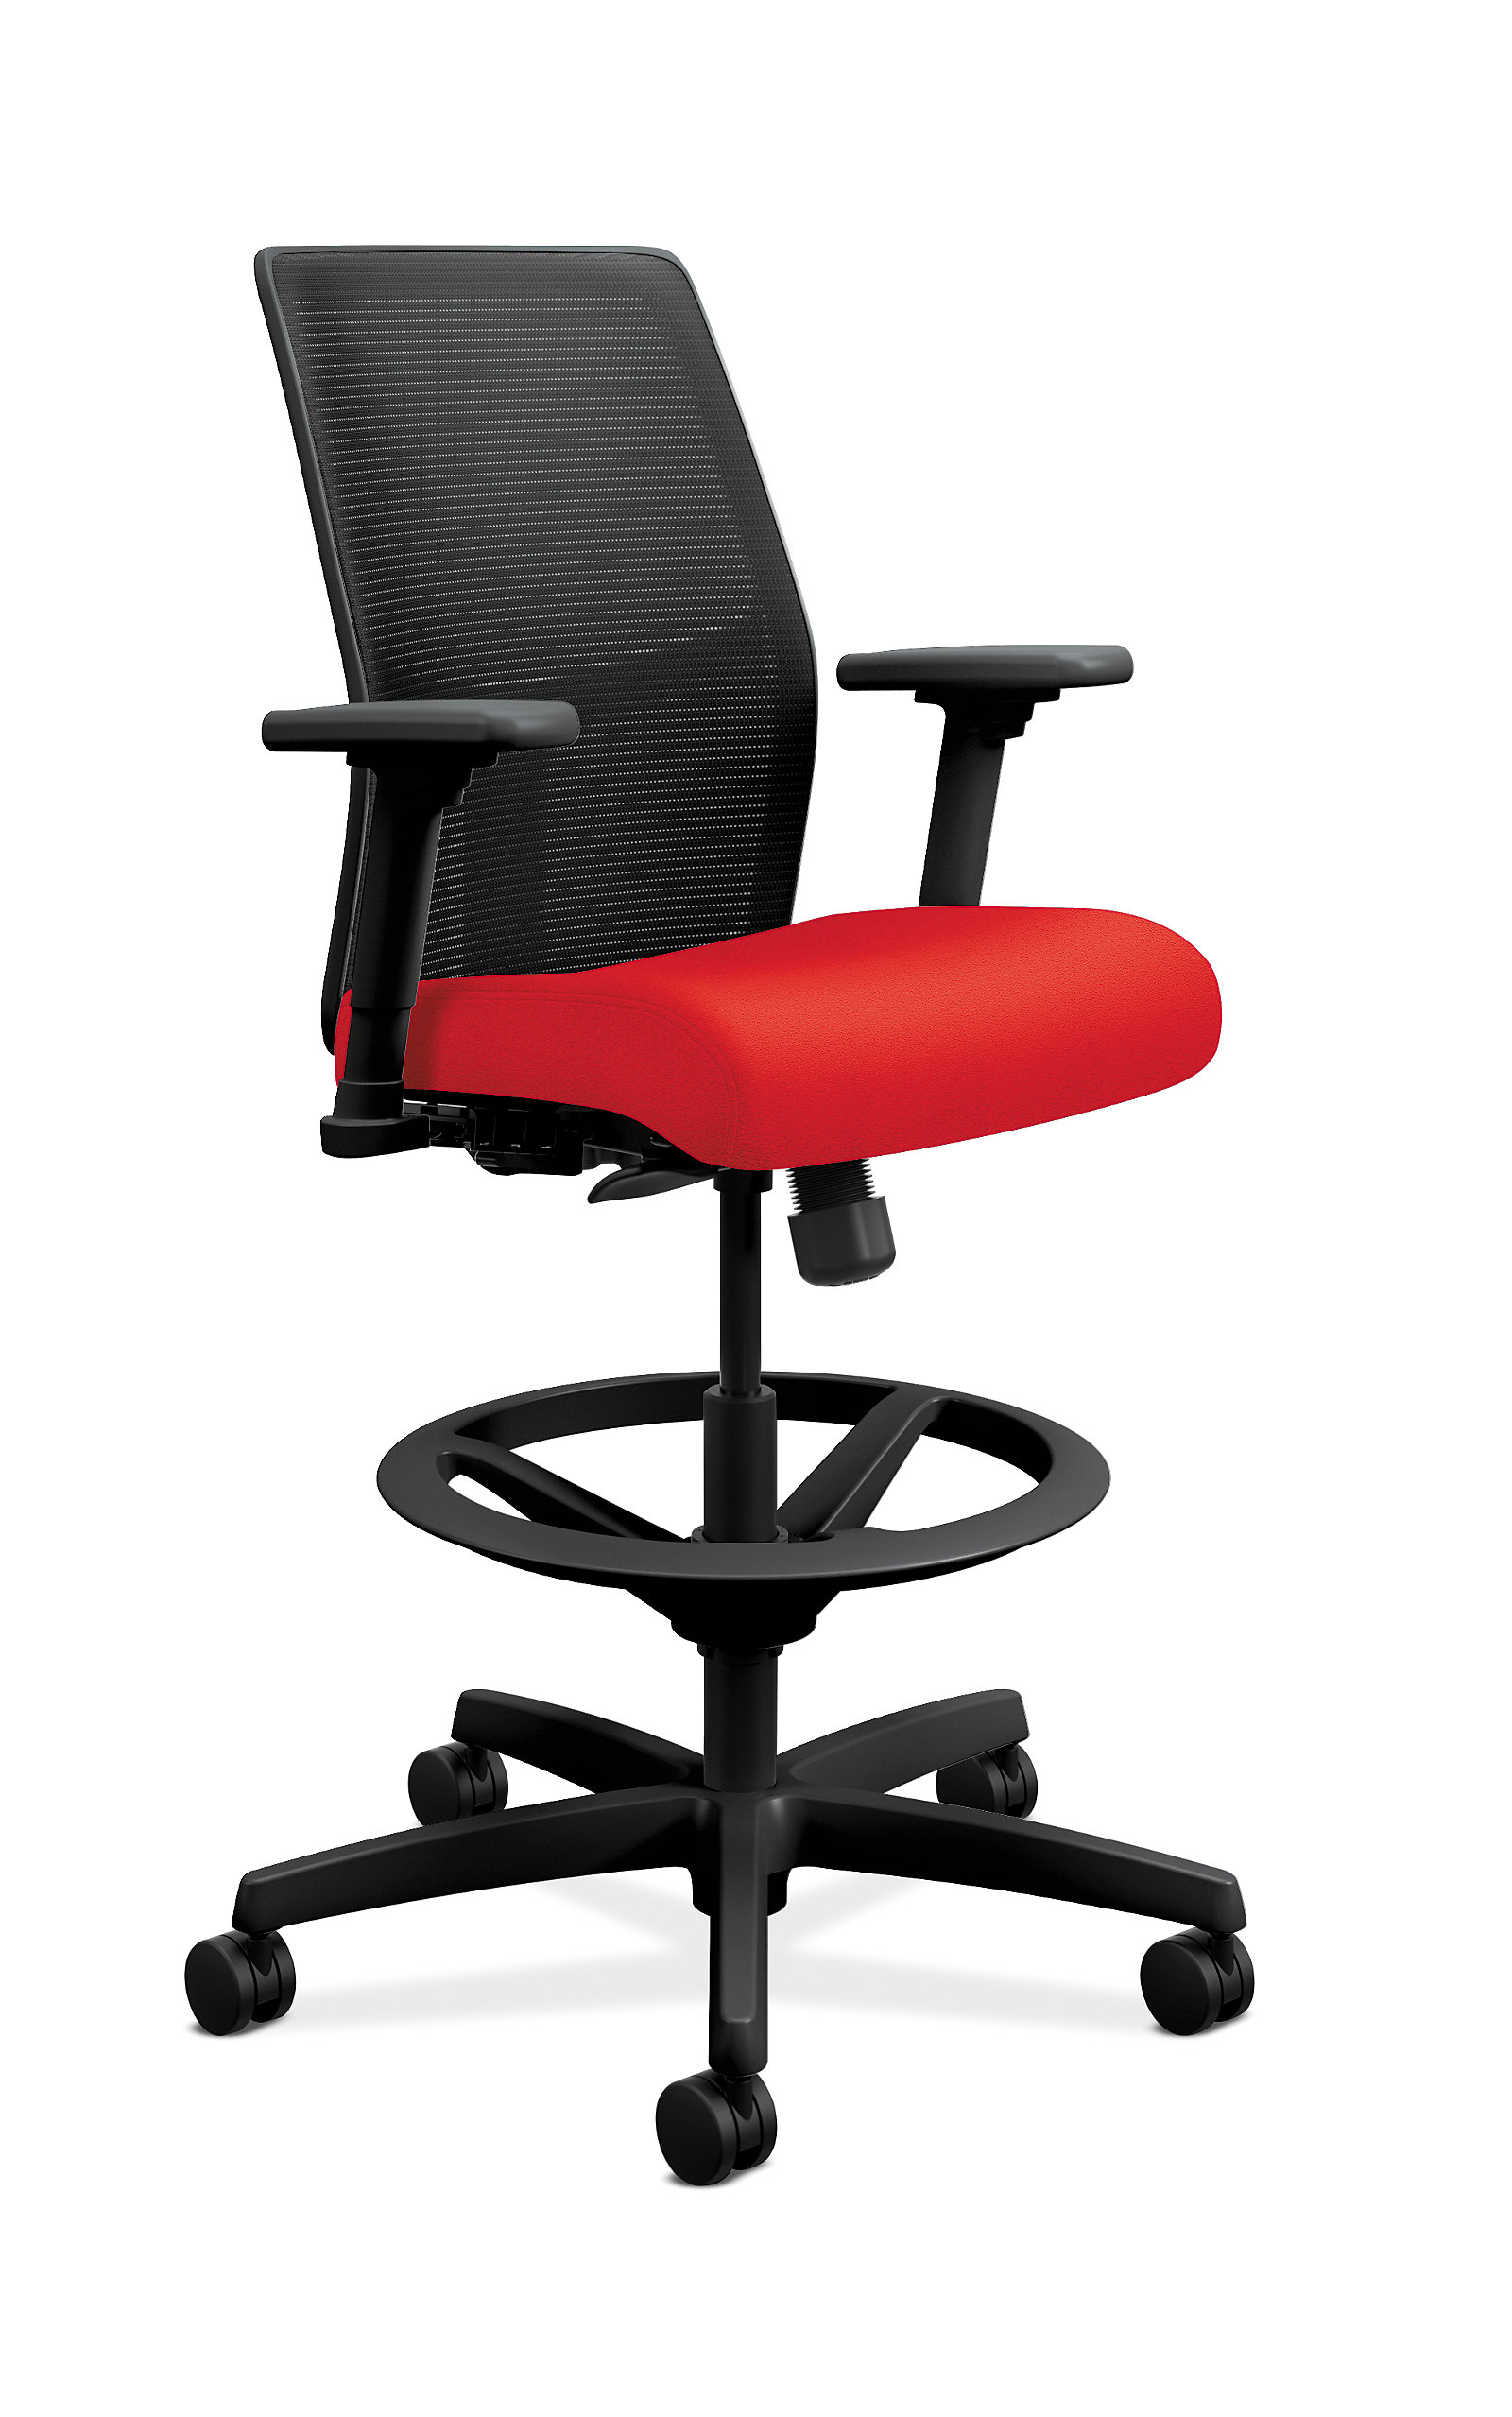 Stools Multi Purpose Chairs